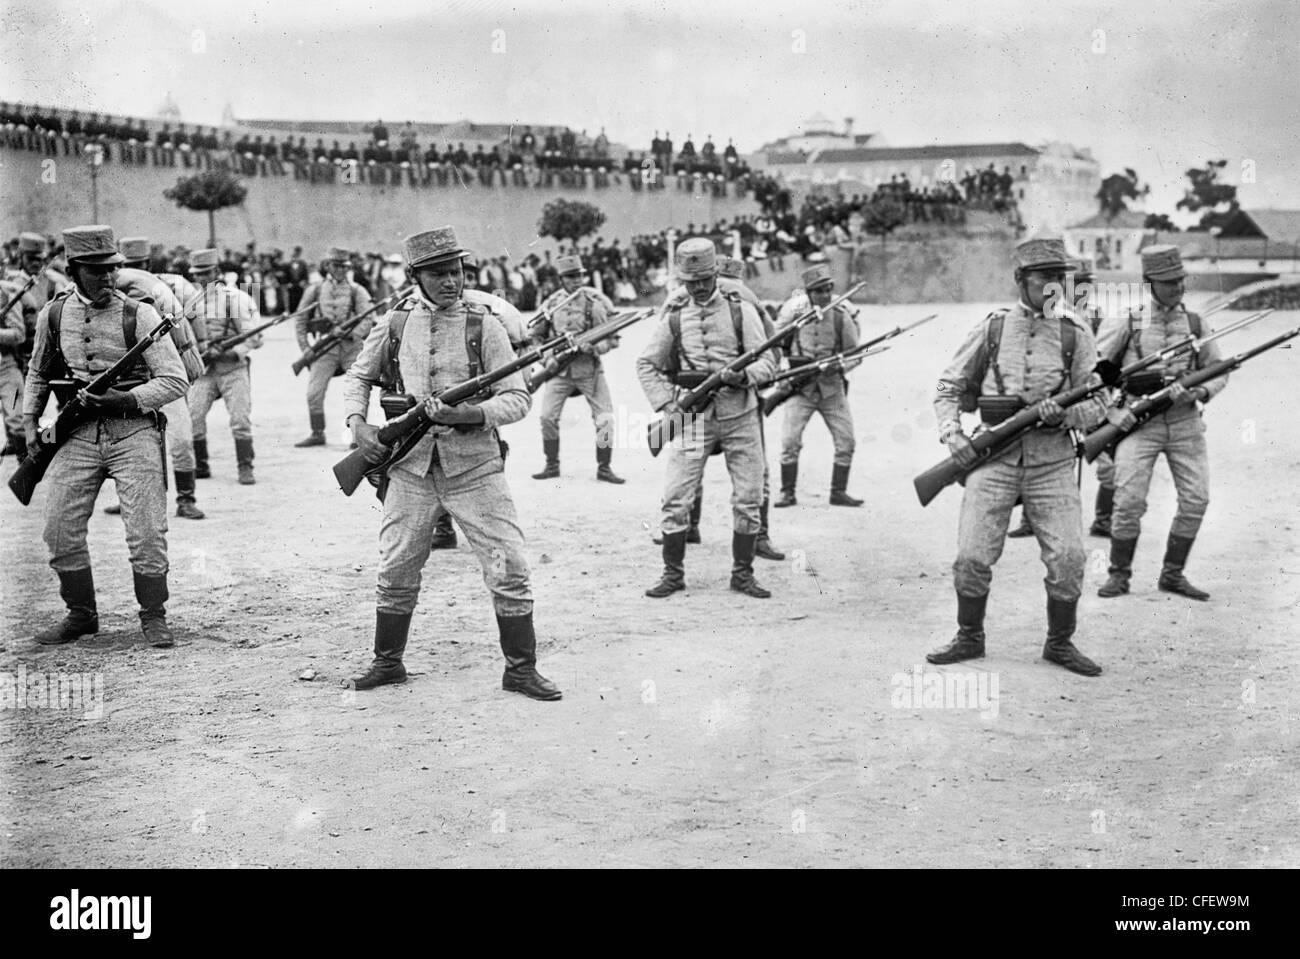 Infantry, Portugal, circa 1915 - Stock Image